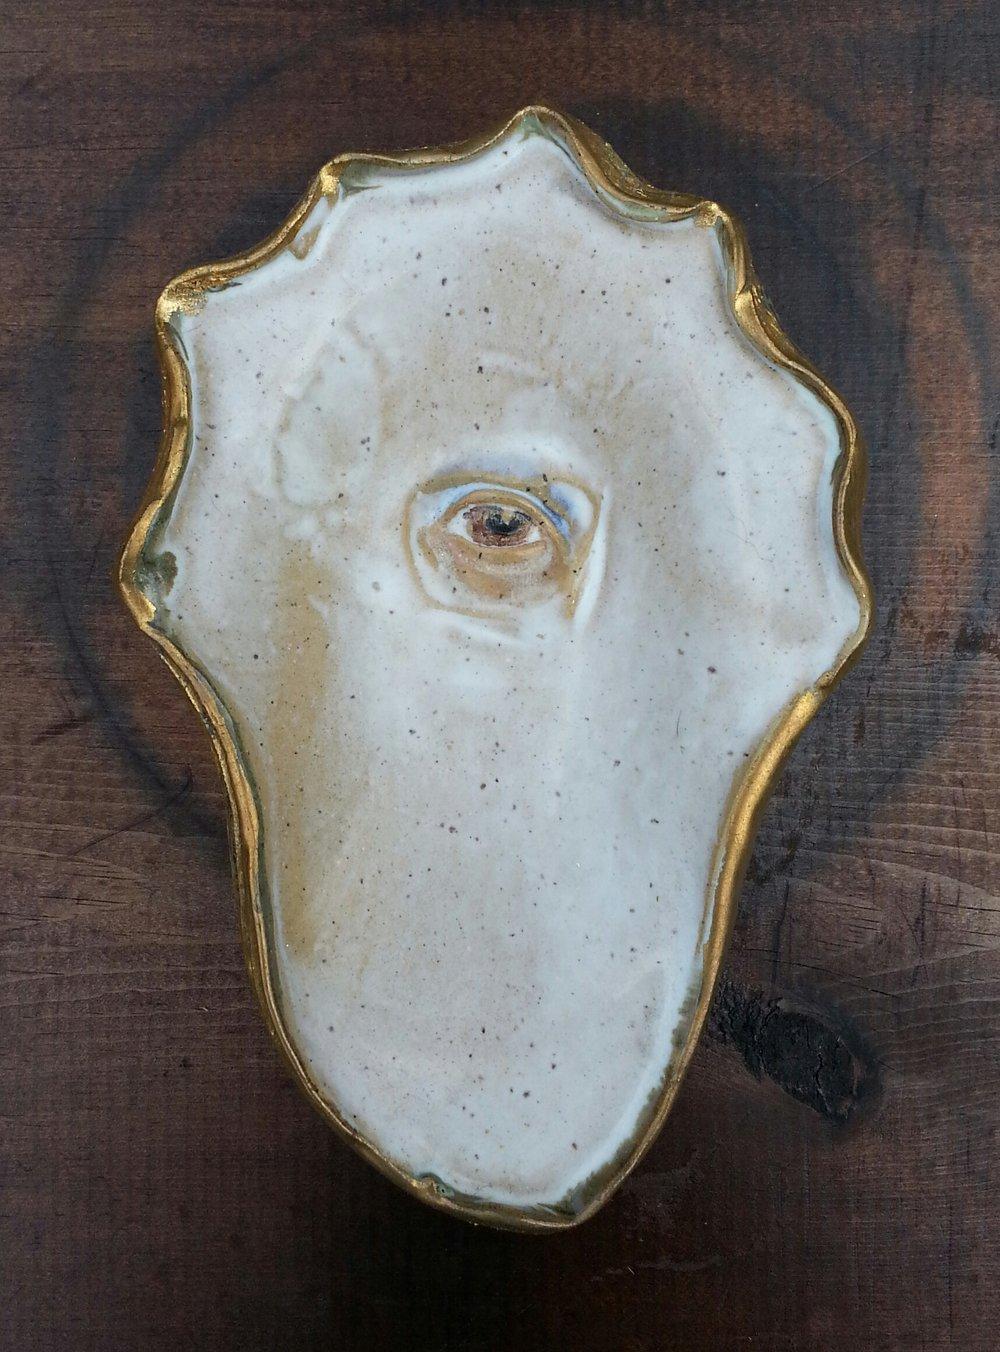 oyster with eye.jpg